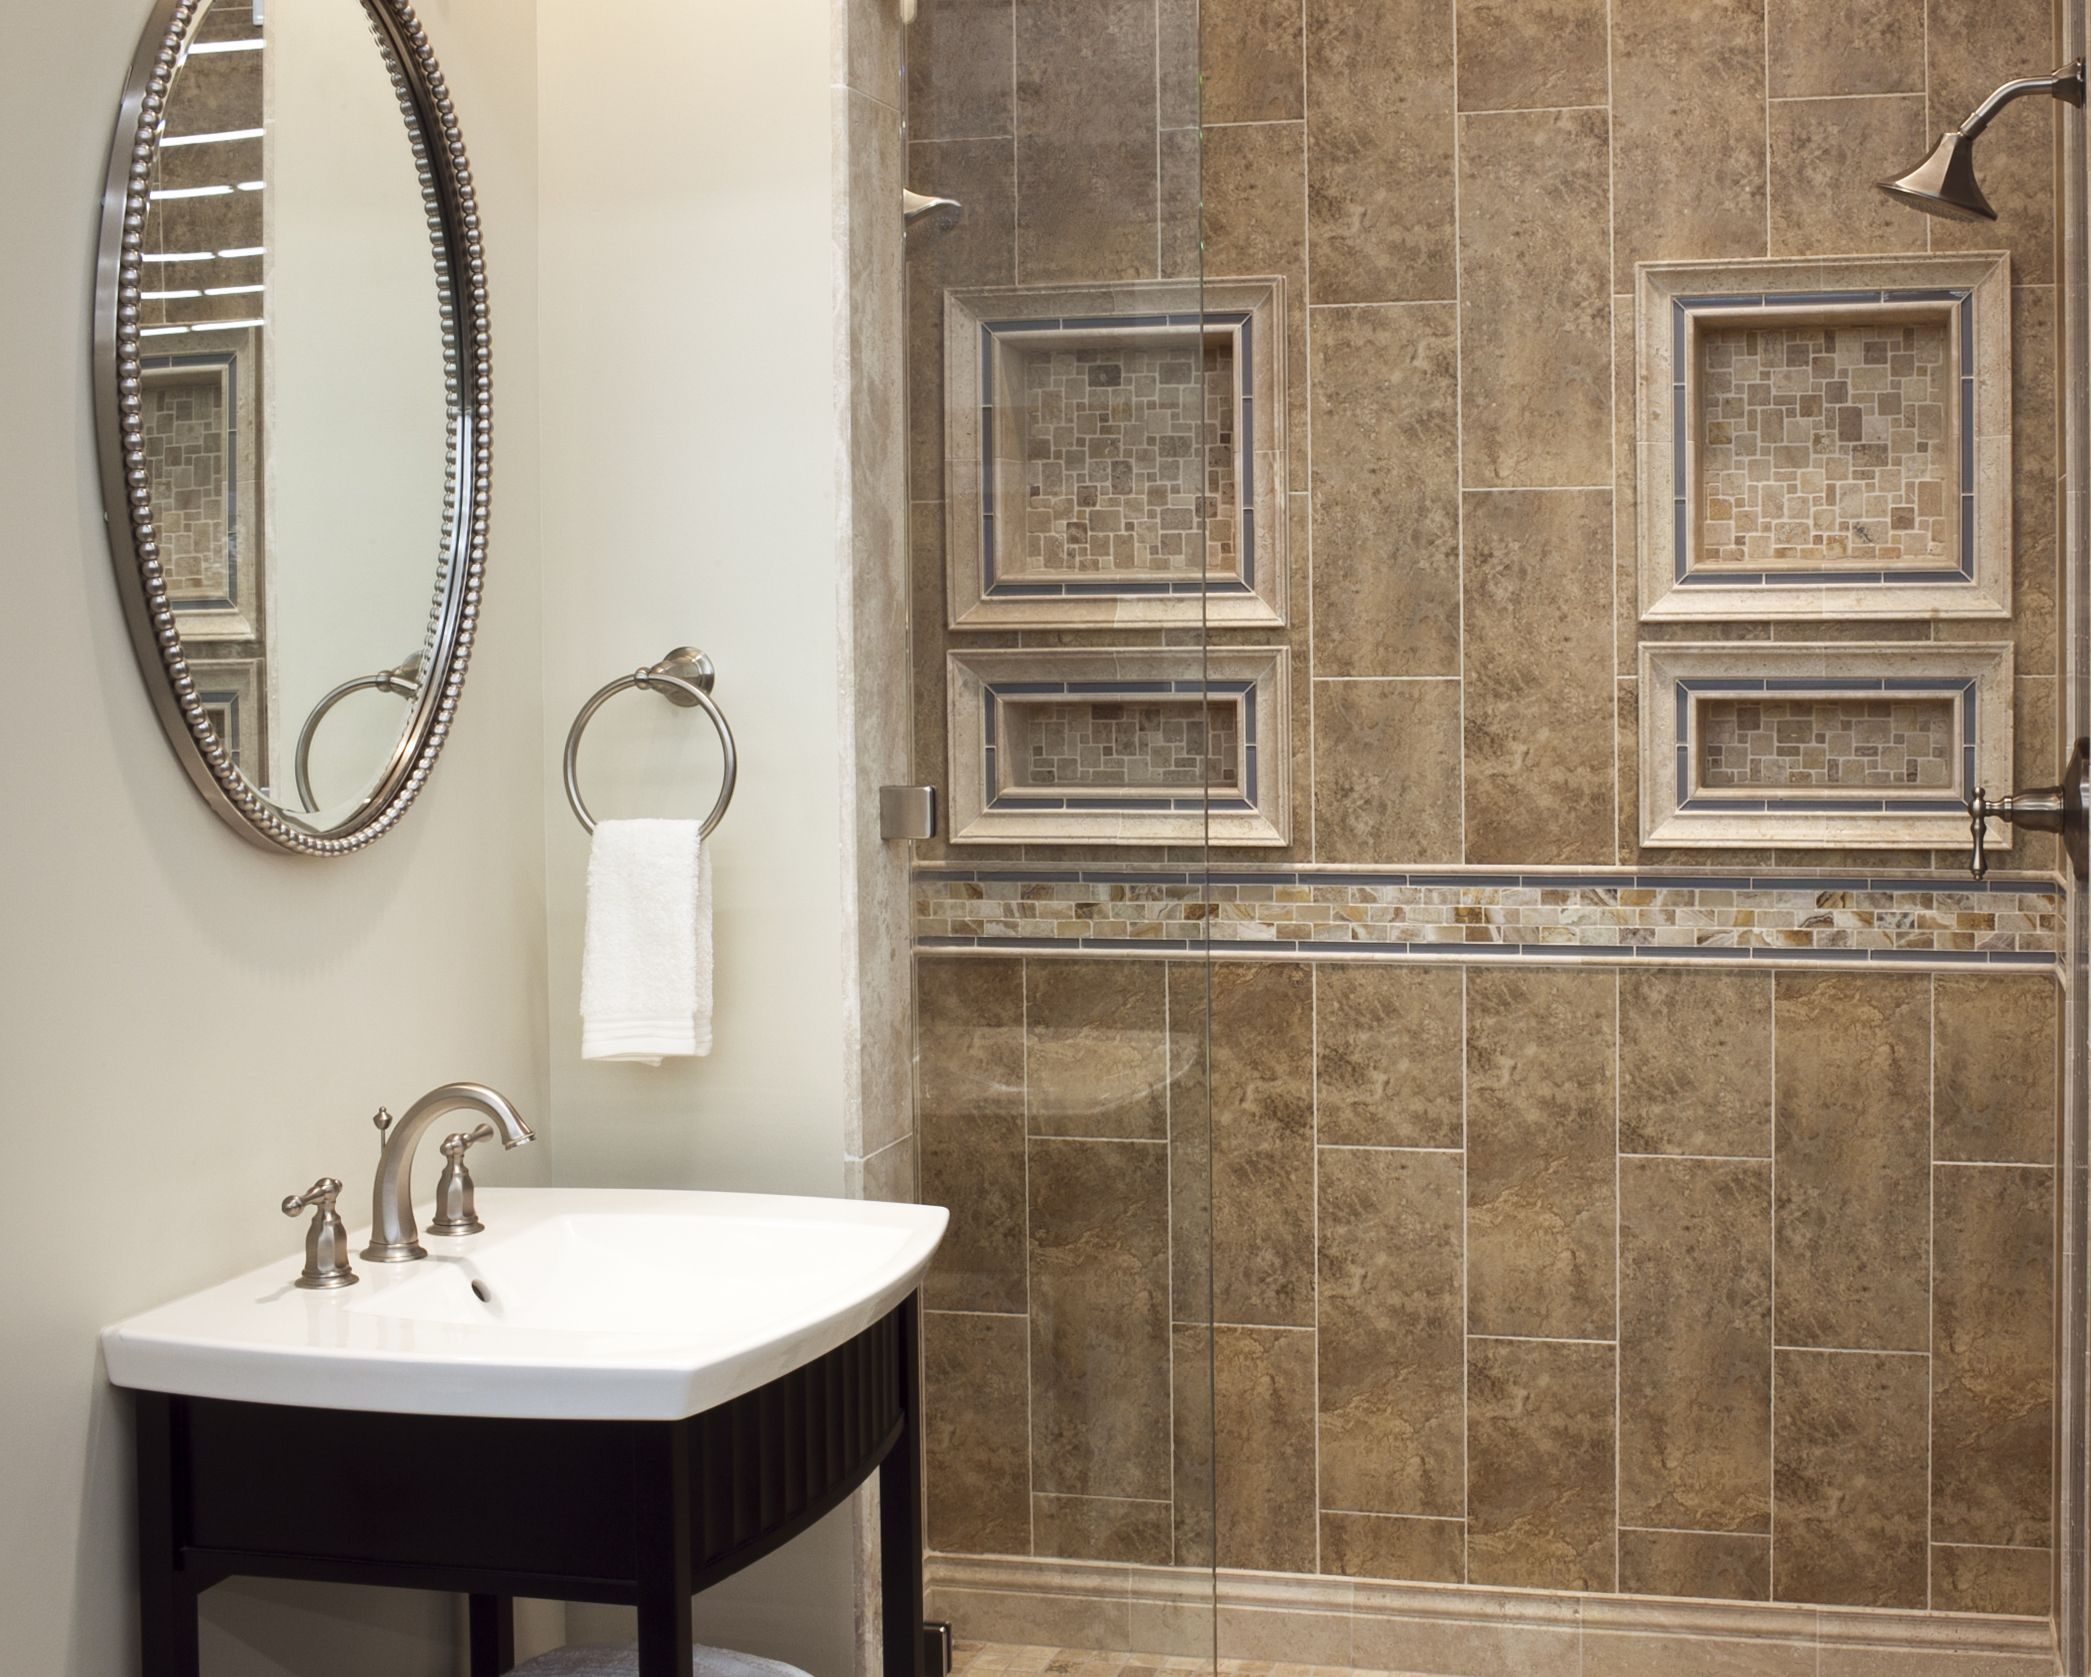 Imperial Beige Ceramic Wall Tile Shower.   Bathroom   Pinterest ...